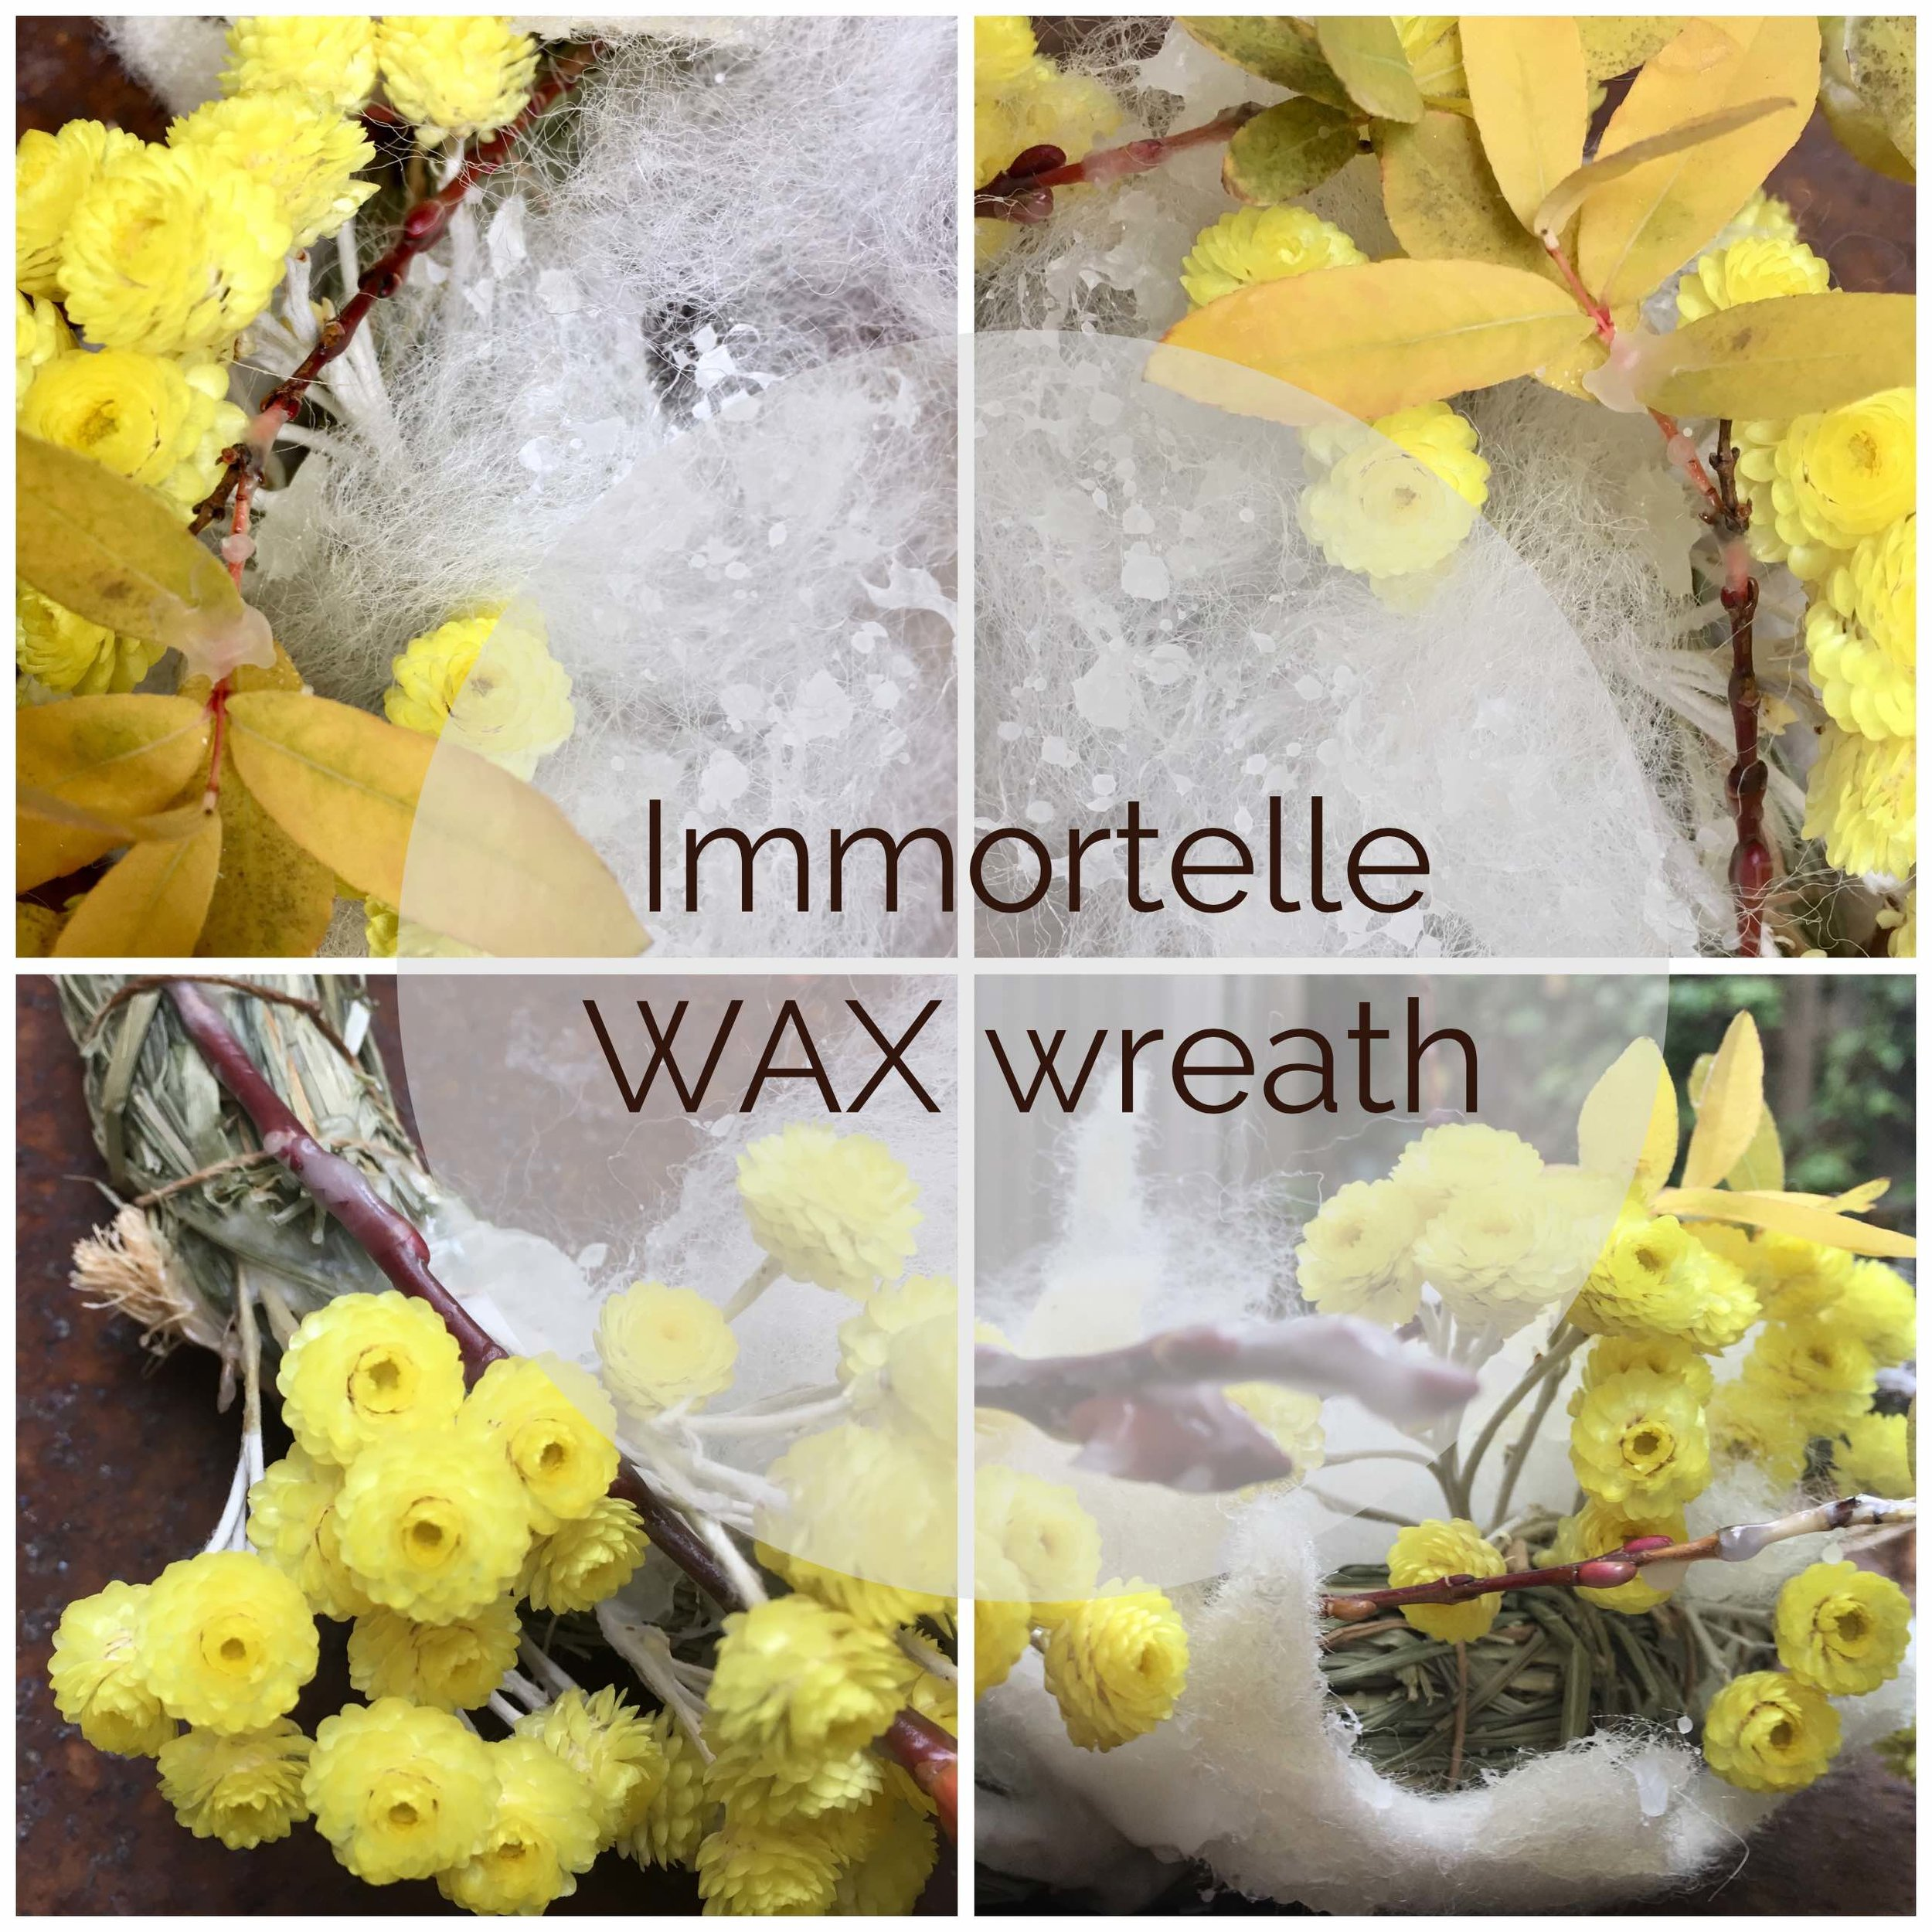 Immortelle wreath: 500kb.jpg